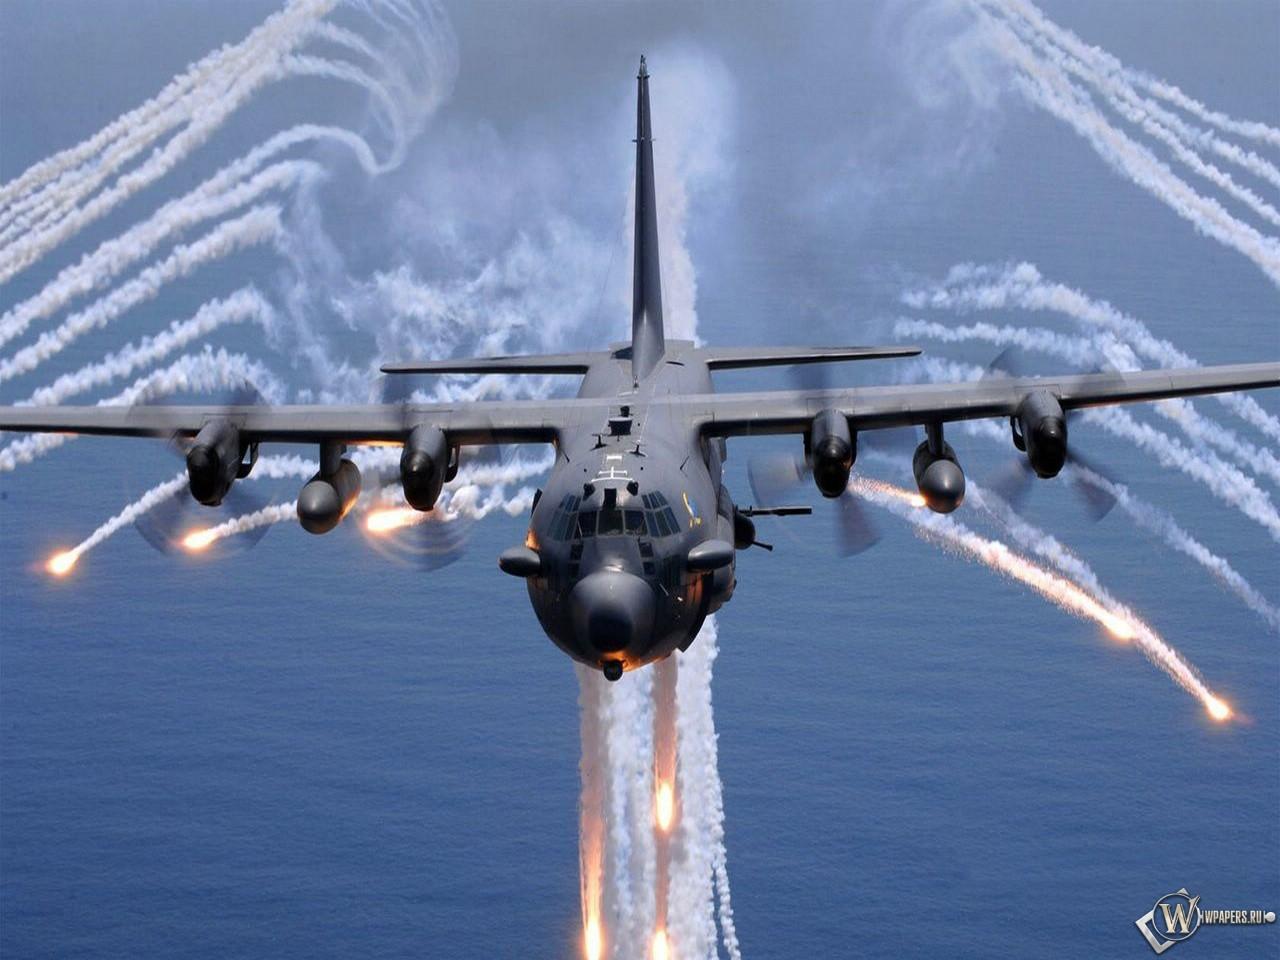 Lockheed AC-130 1280x960